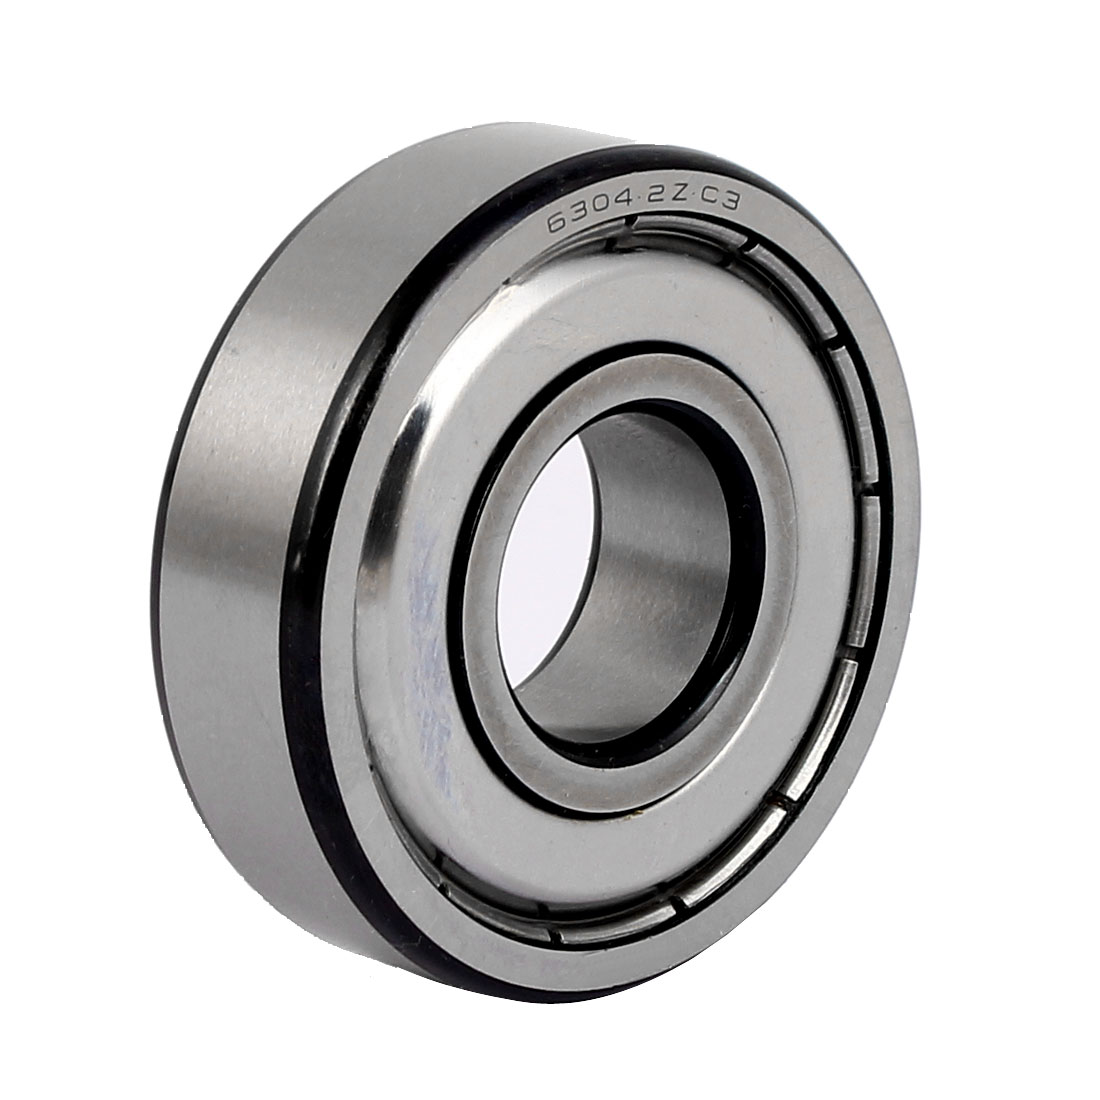 ZZ6304 52mmx20mmx15mm Single Row Deep Groove Shielded Ball Bearing